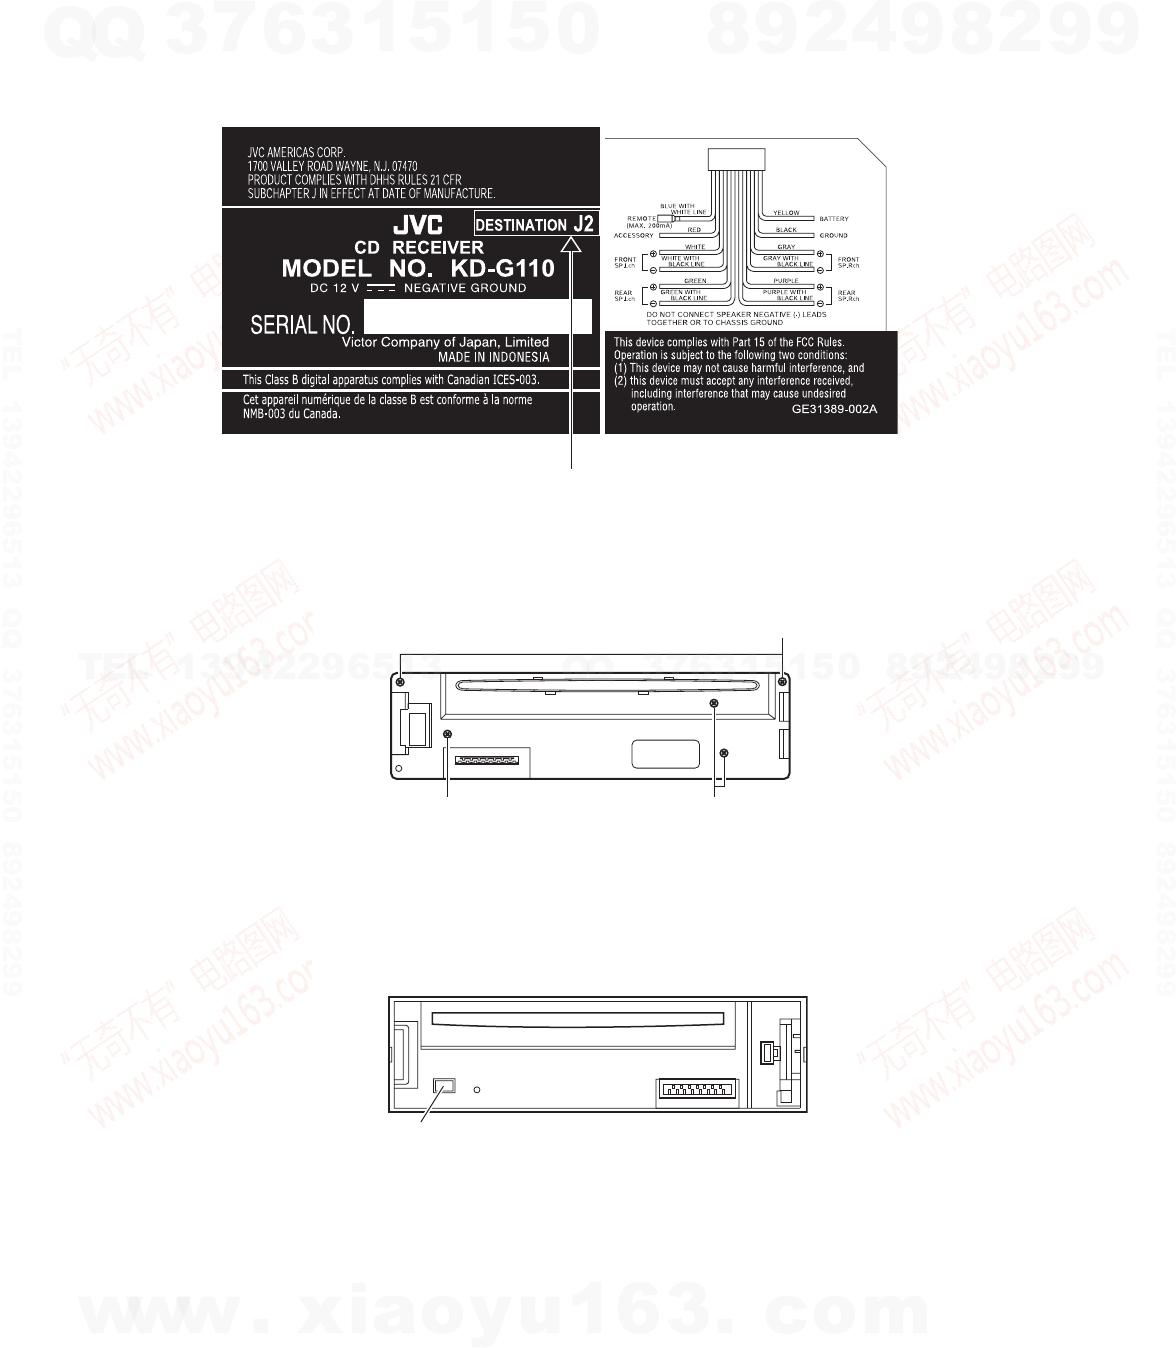 jvc kd g110 wiring diagram ma121 kd s11 2013070449  ma121 kd s11 2013070449